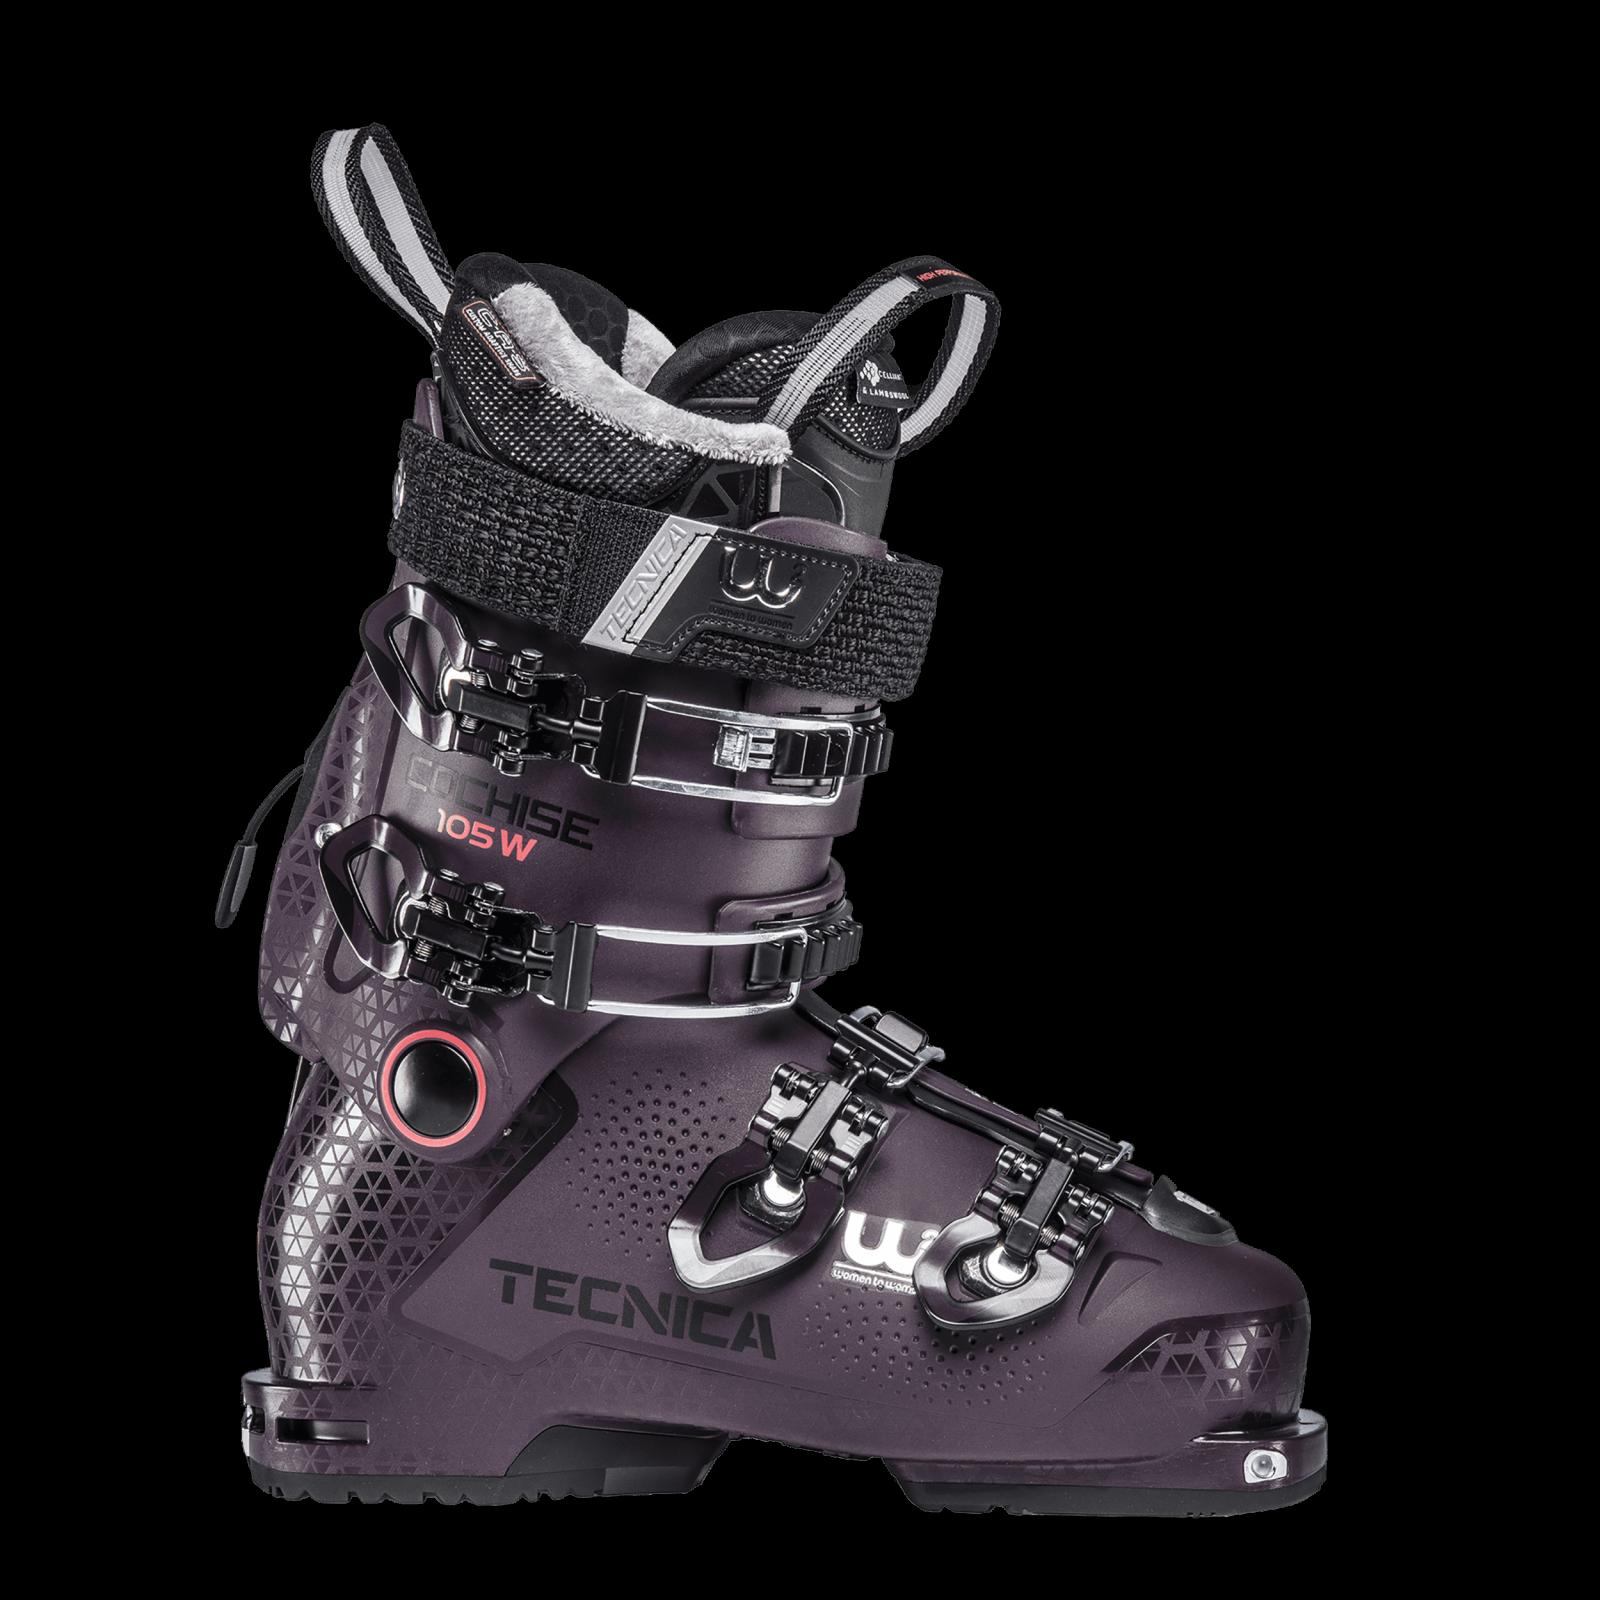 Tecnica Cochise 105 DYN Women's Ski Boots